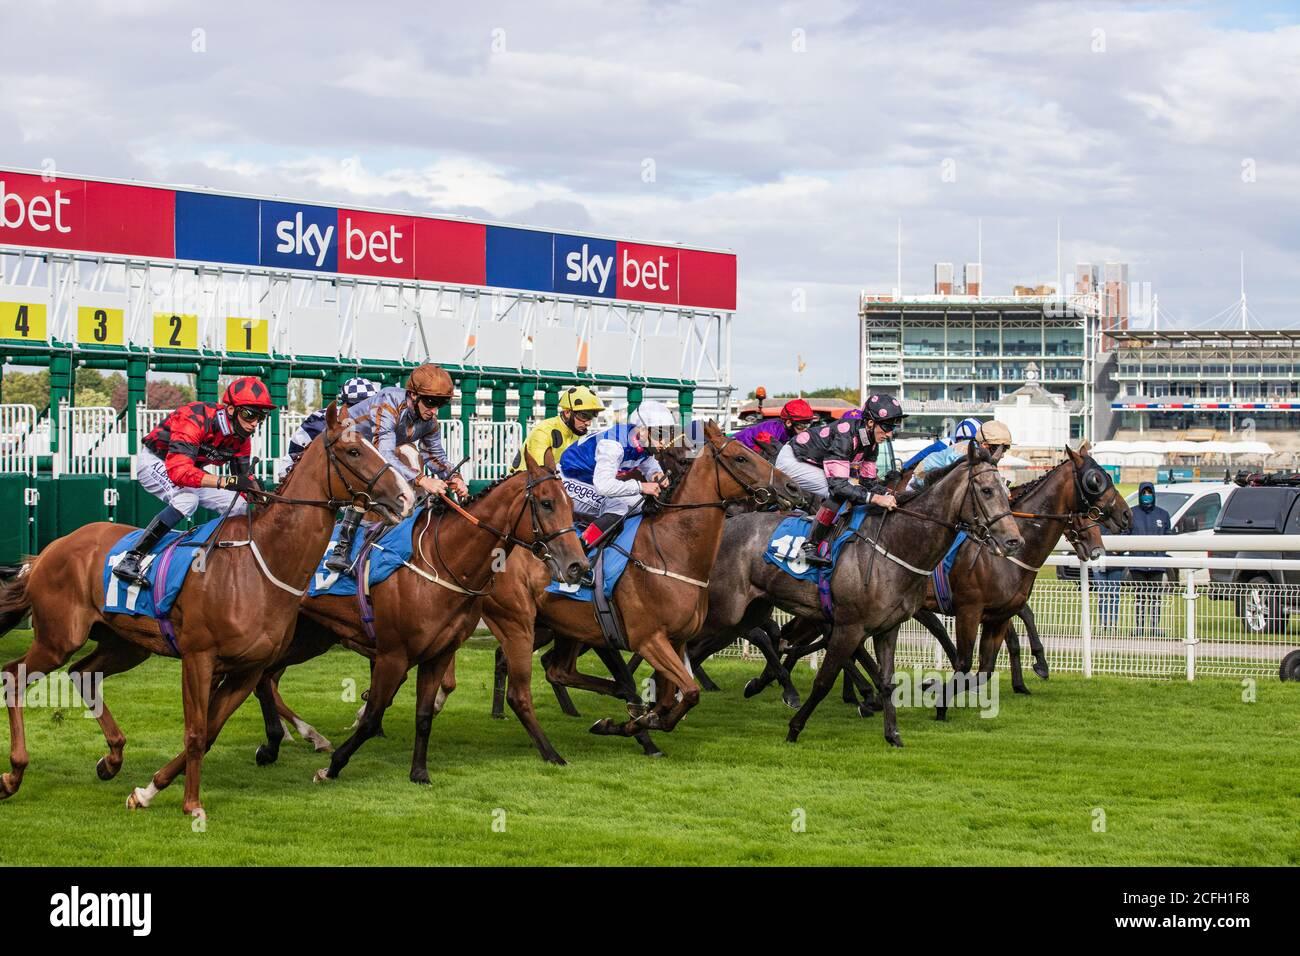 horses-leave-the-start-of-the-sky-bet-ha